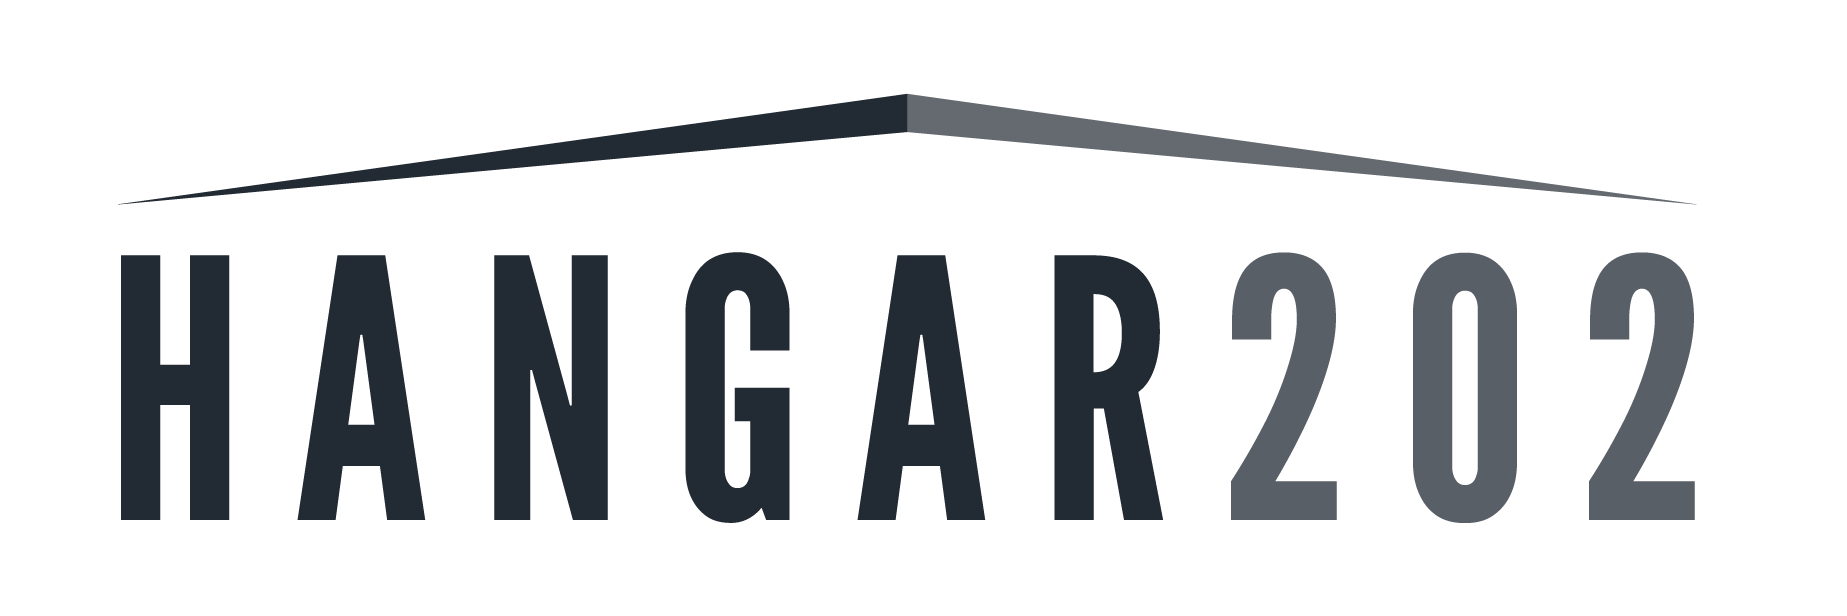 hangar202 Logo5 v1 white copy_blue_1